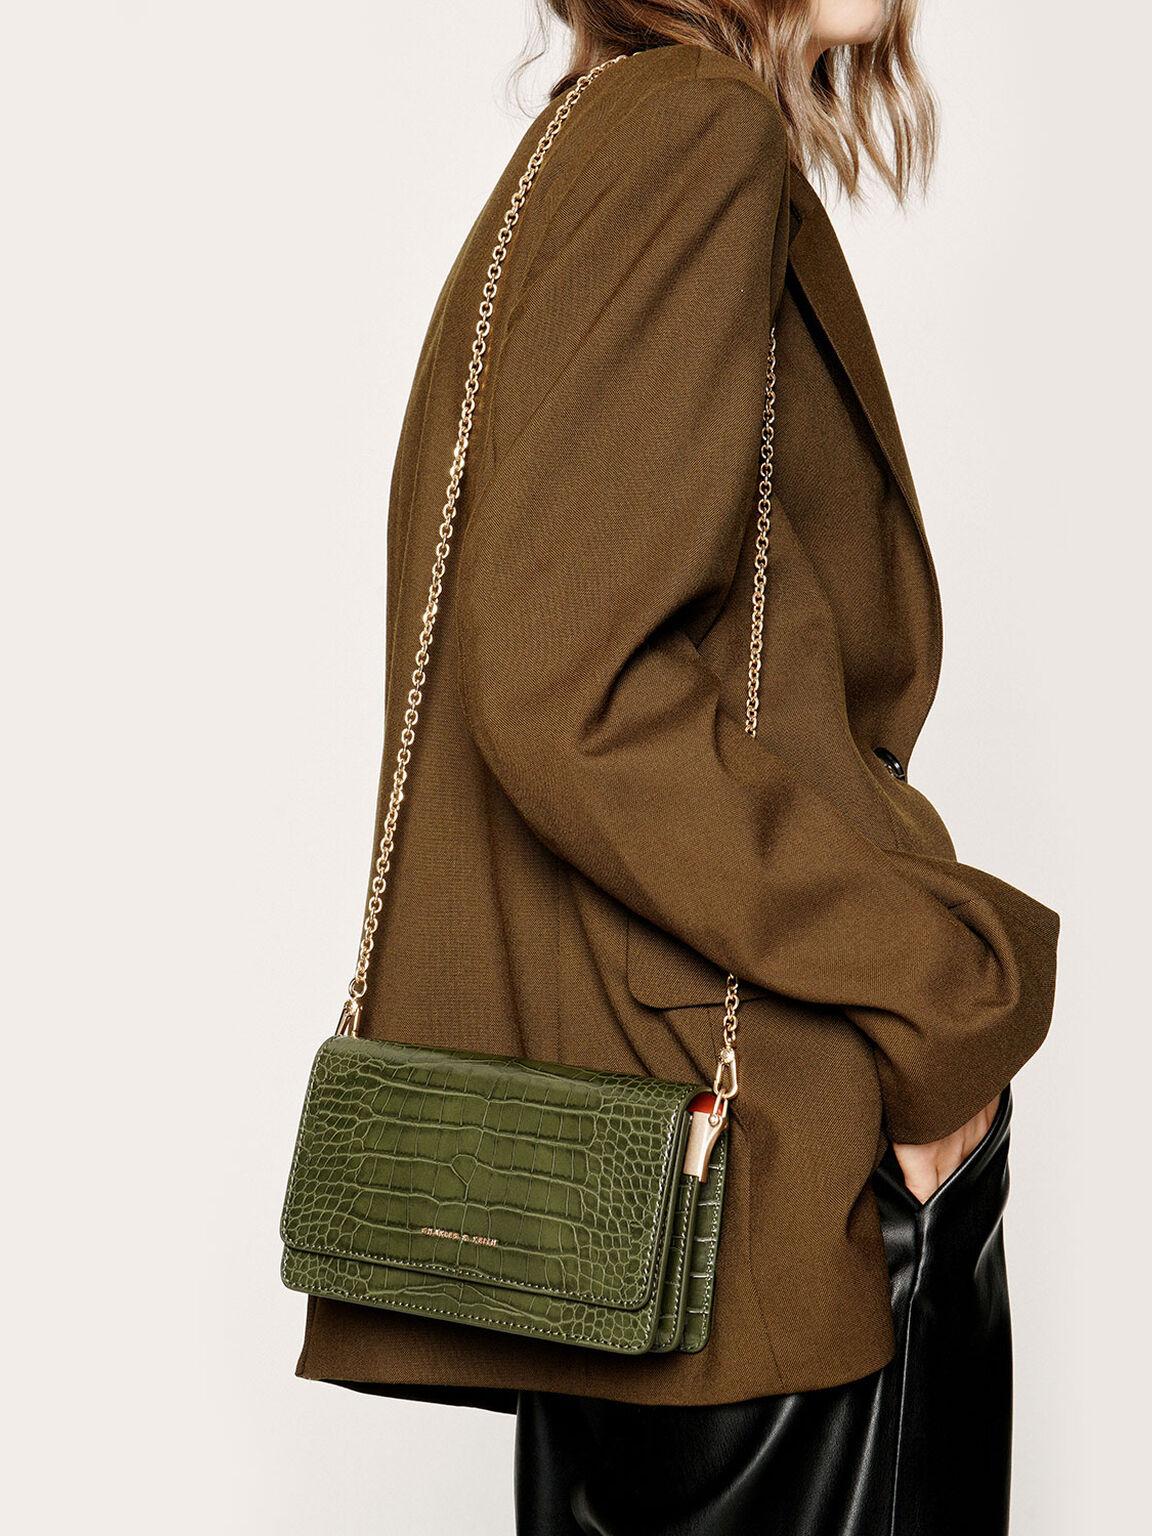 鱷魚紋手拿包, 橄欖色, hi-res